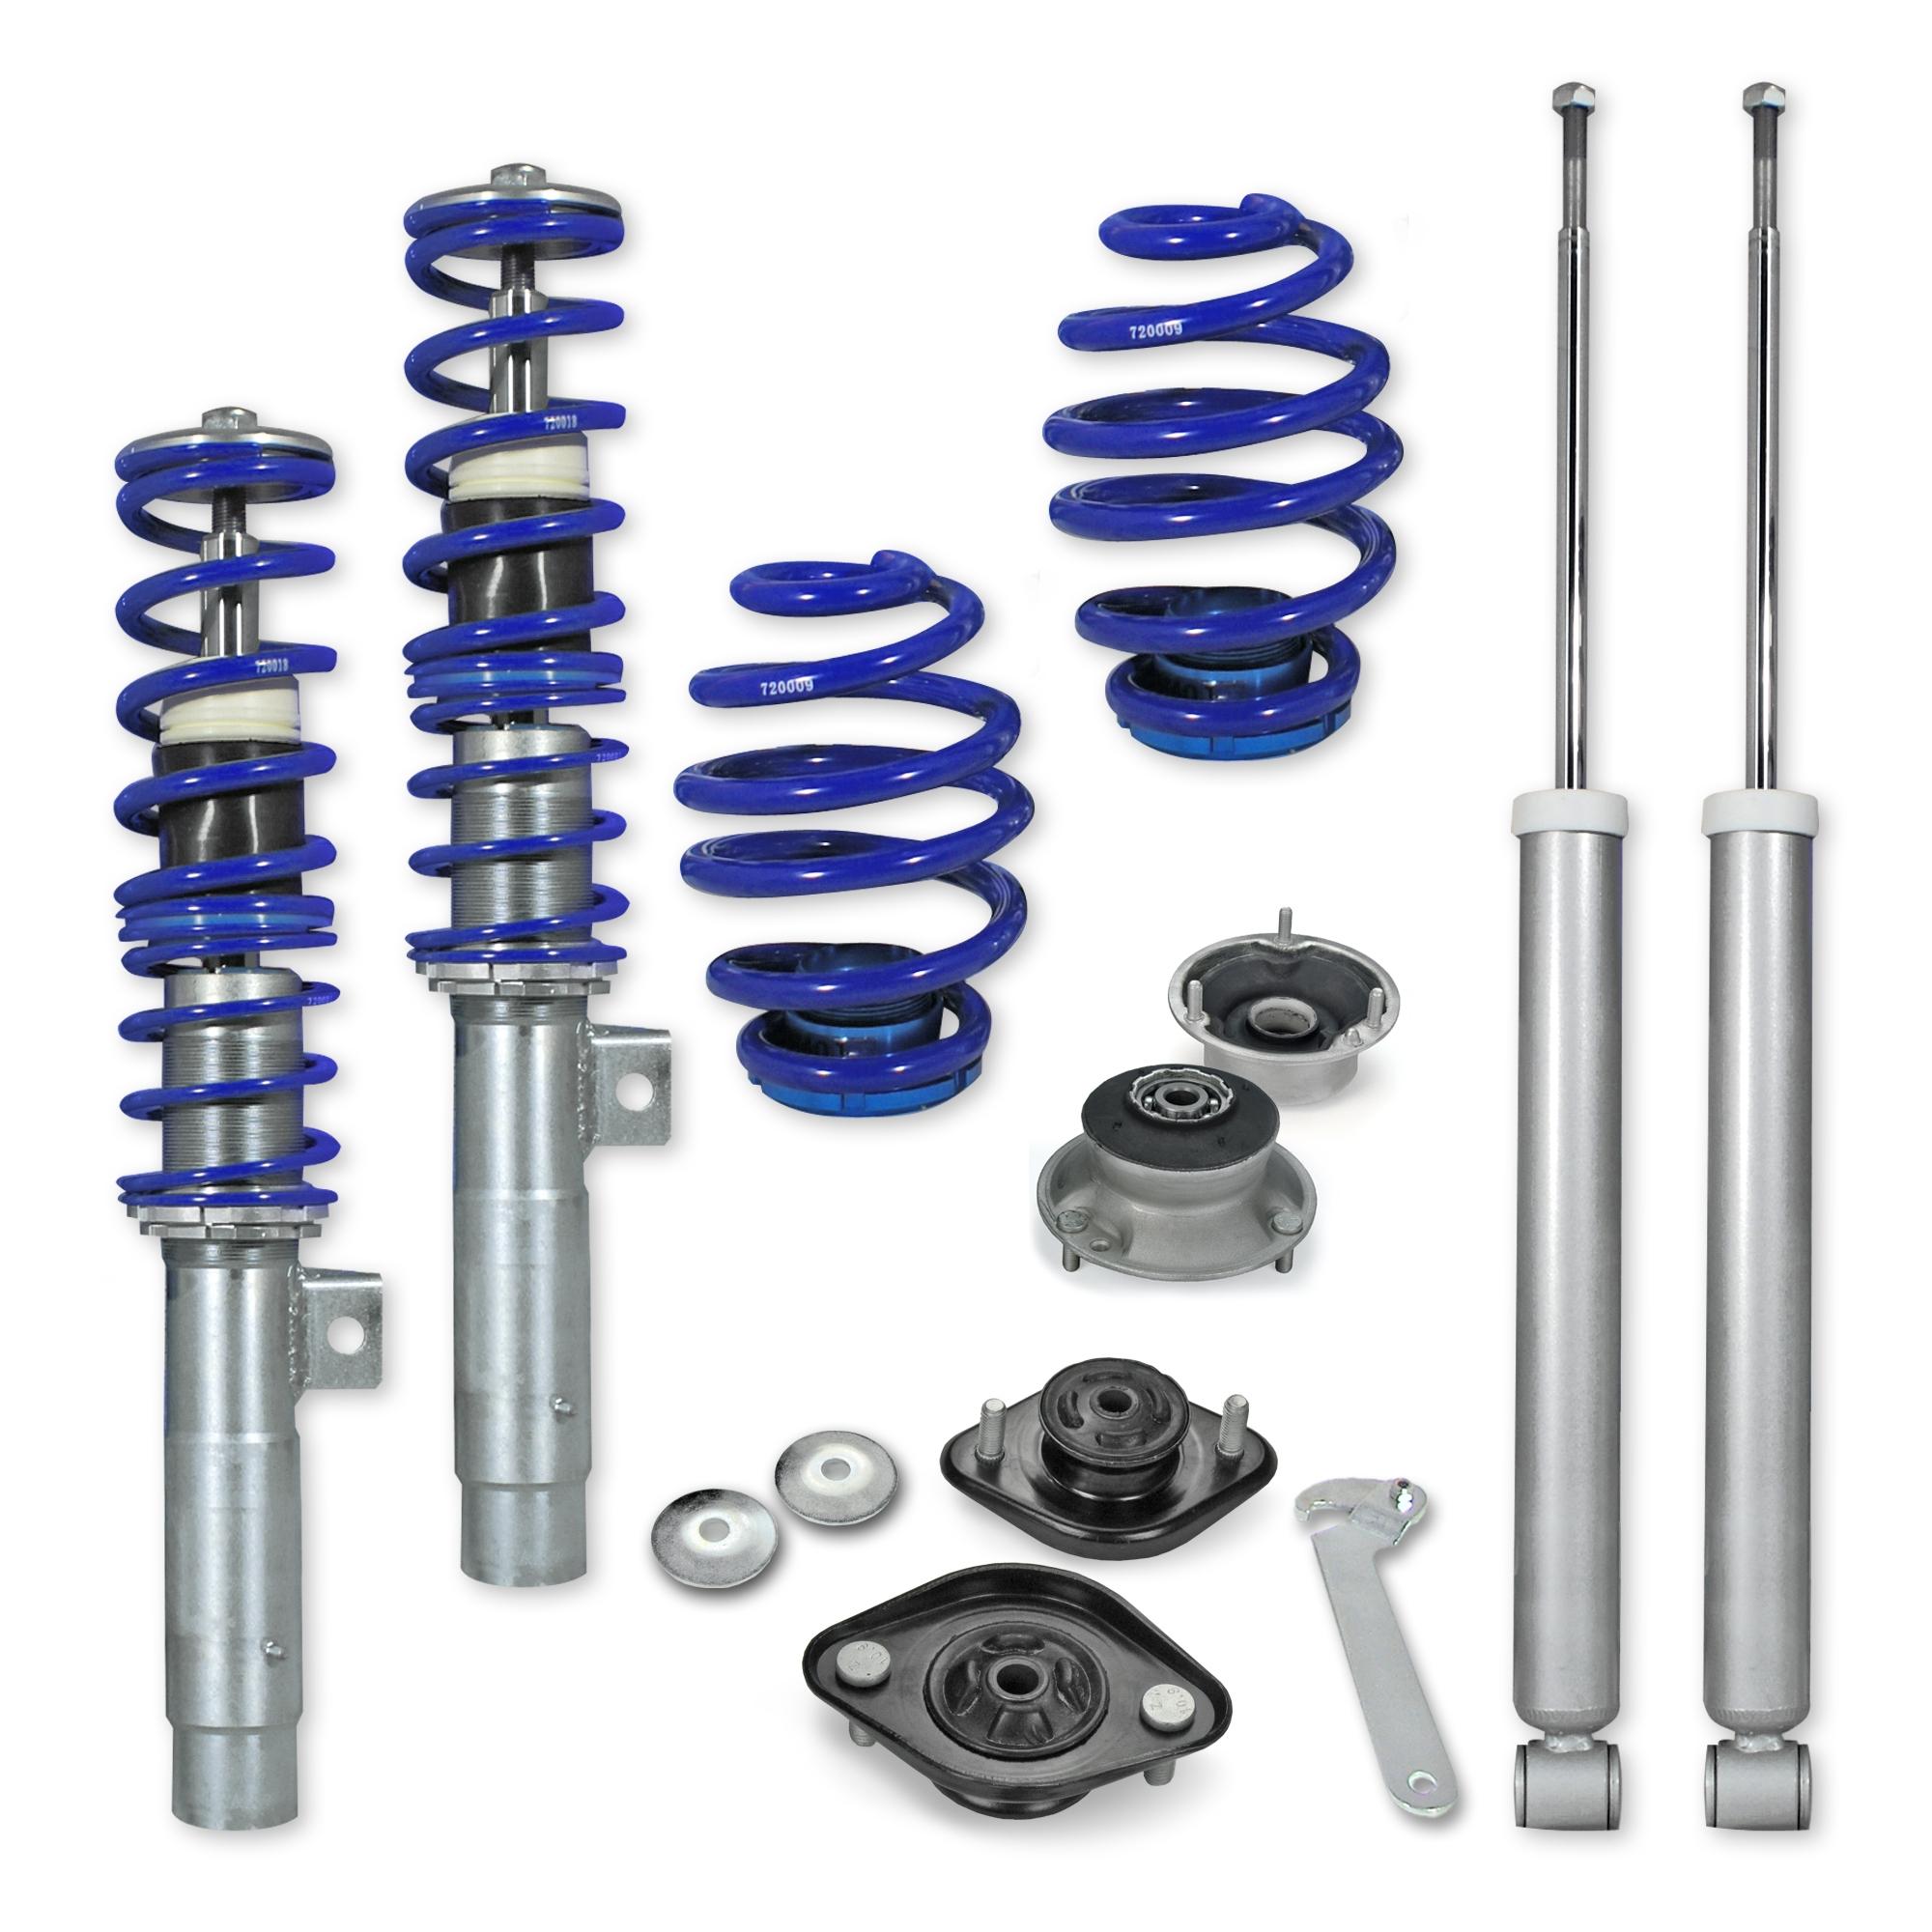 kit suspension combin filet jom blueline bmw e46 4 6 cyl incl touring 98 05 filet. Black Bedroom Furniture Sets. Home Design Ideas